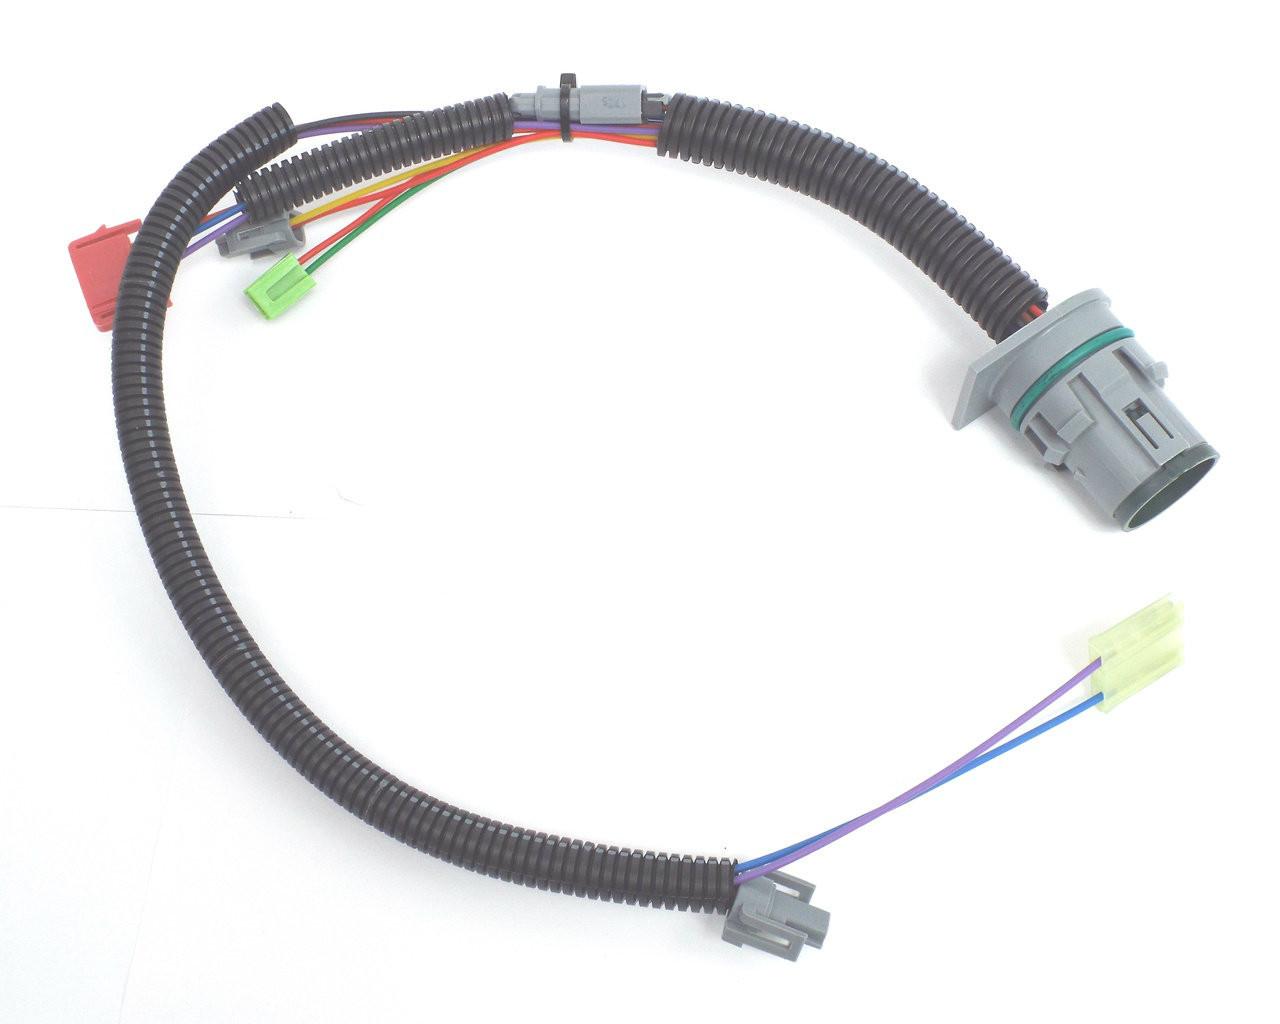 medium resolution of new 4l80e transmission hd internal valve body wiring harness 1991 2003 4l80e wiring harness